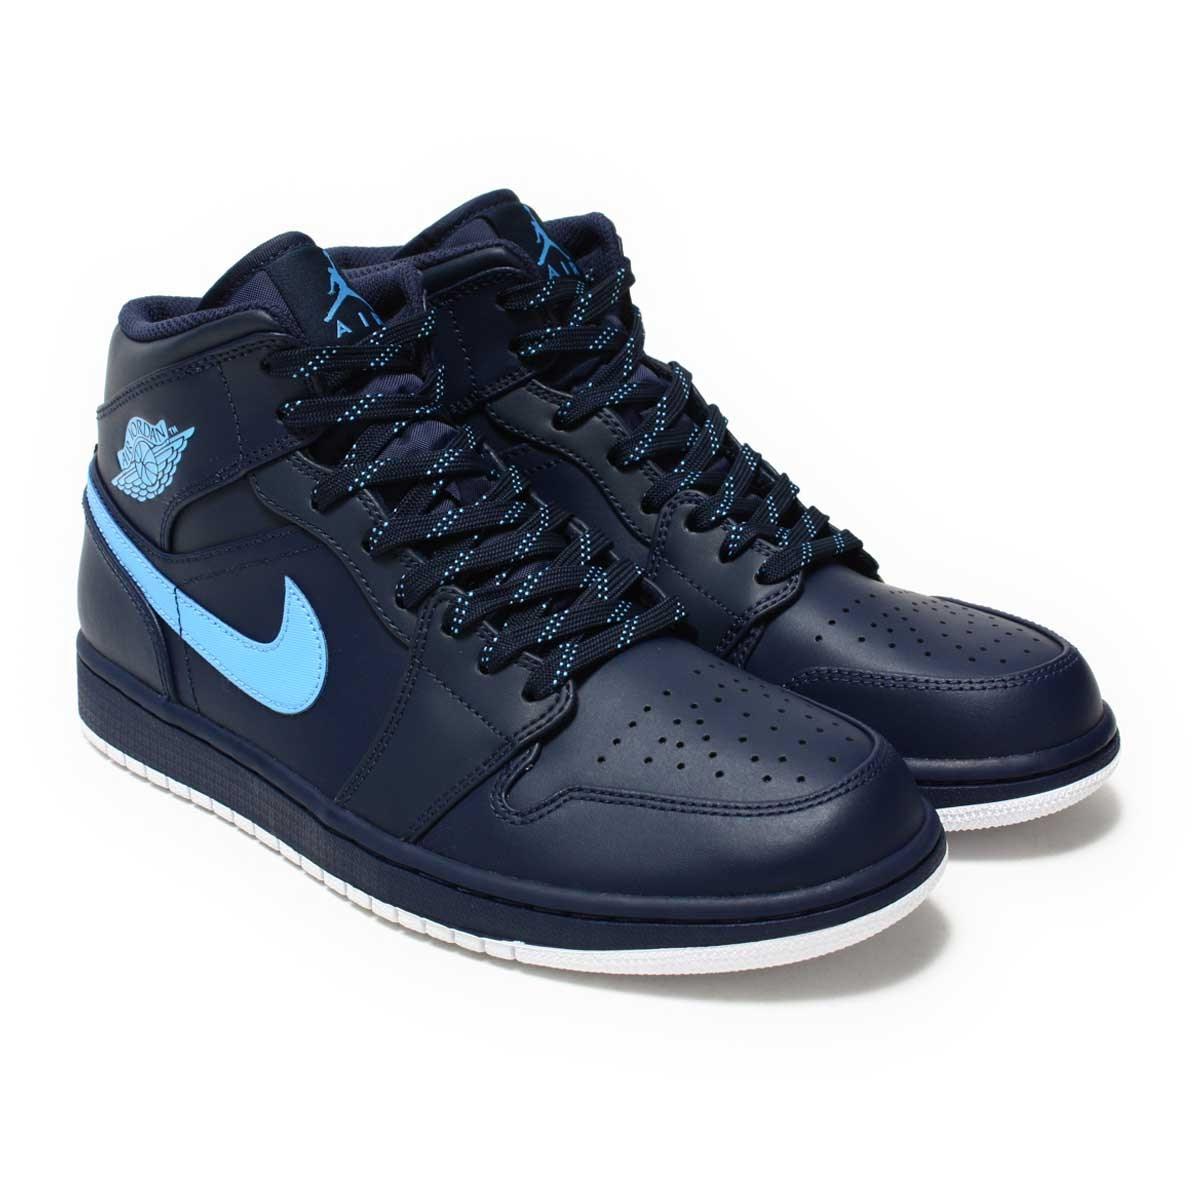 dd2e27c6dde734 MID cut version of Air Jordan 1 who it was first sig nature shoes of Michael  Jordan